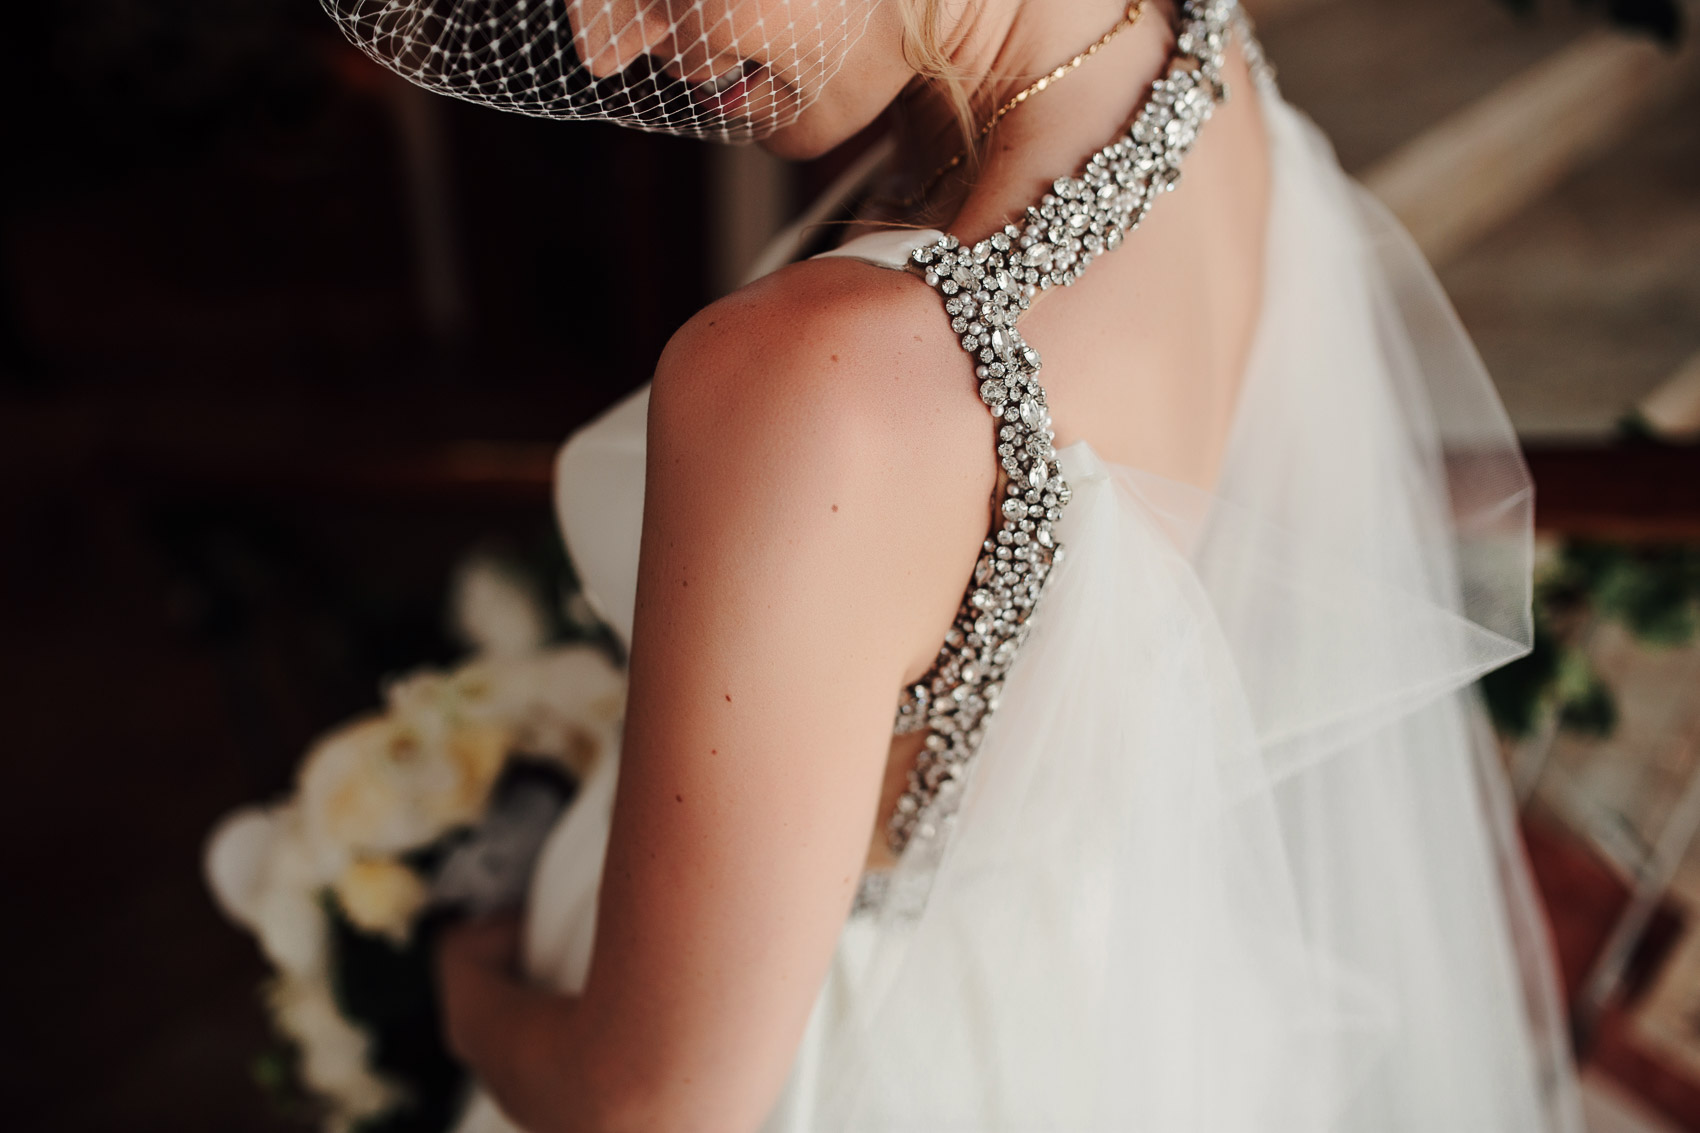 detalle pedreria joyeria vestido